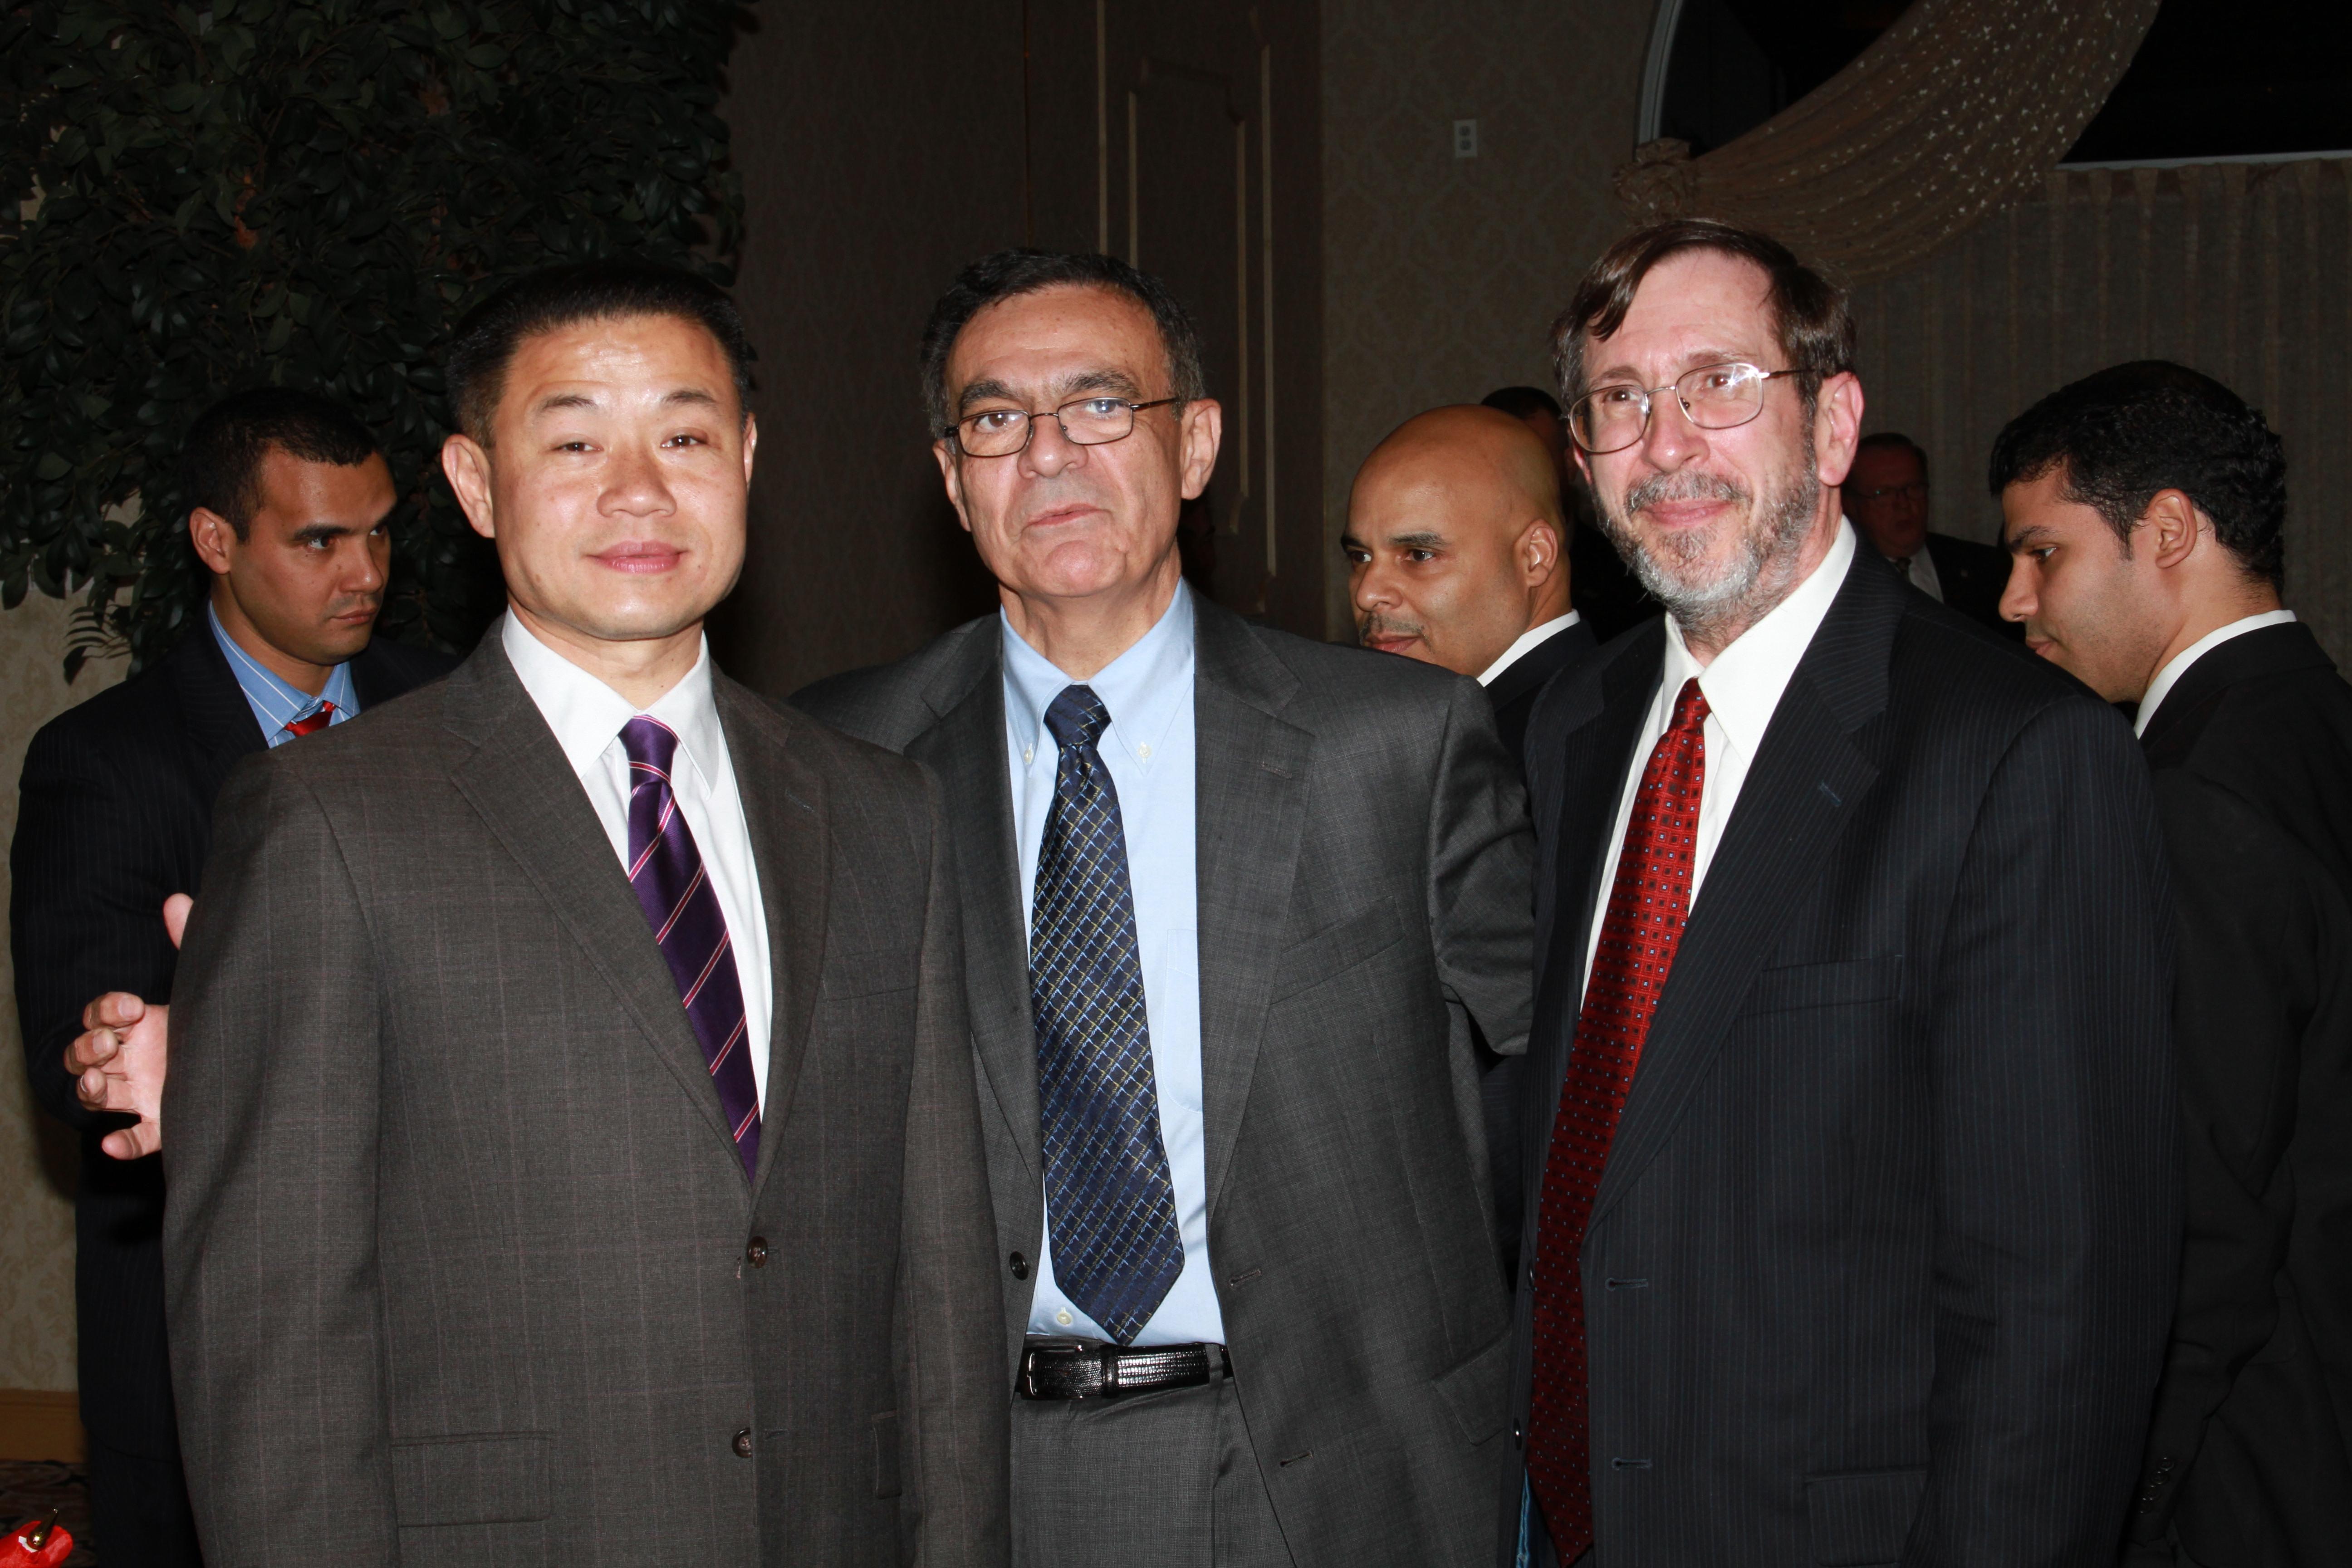 John Liu Comptroller (left) Dr. Antonio Perez, Dr. Vinton Thompson